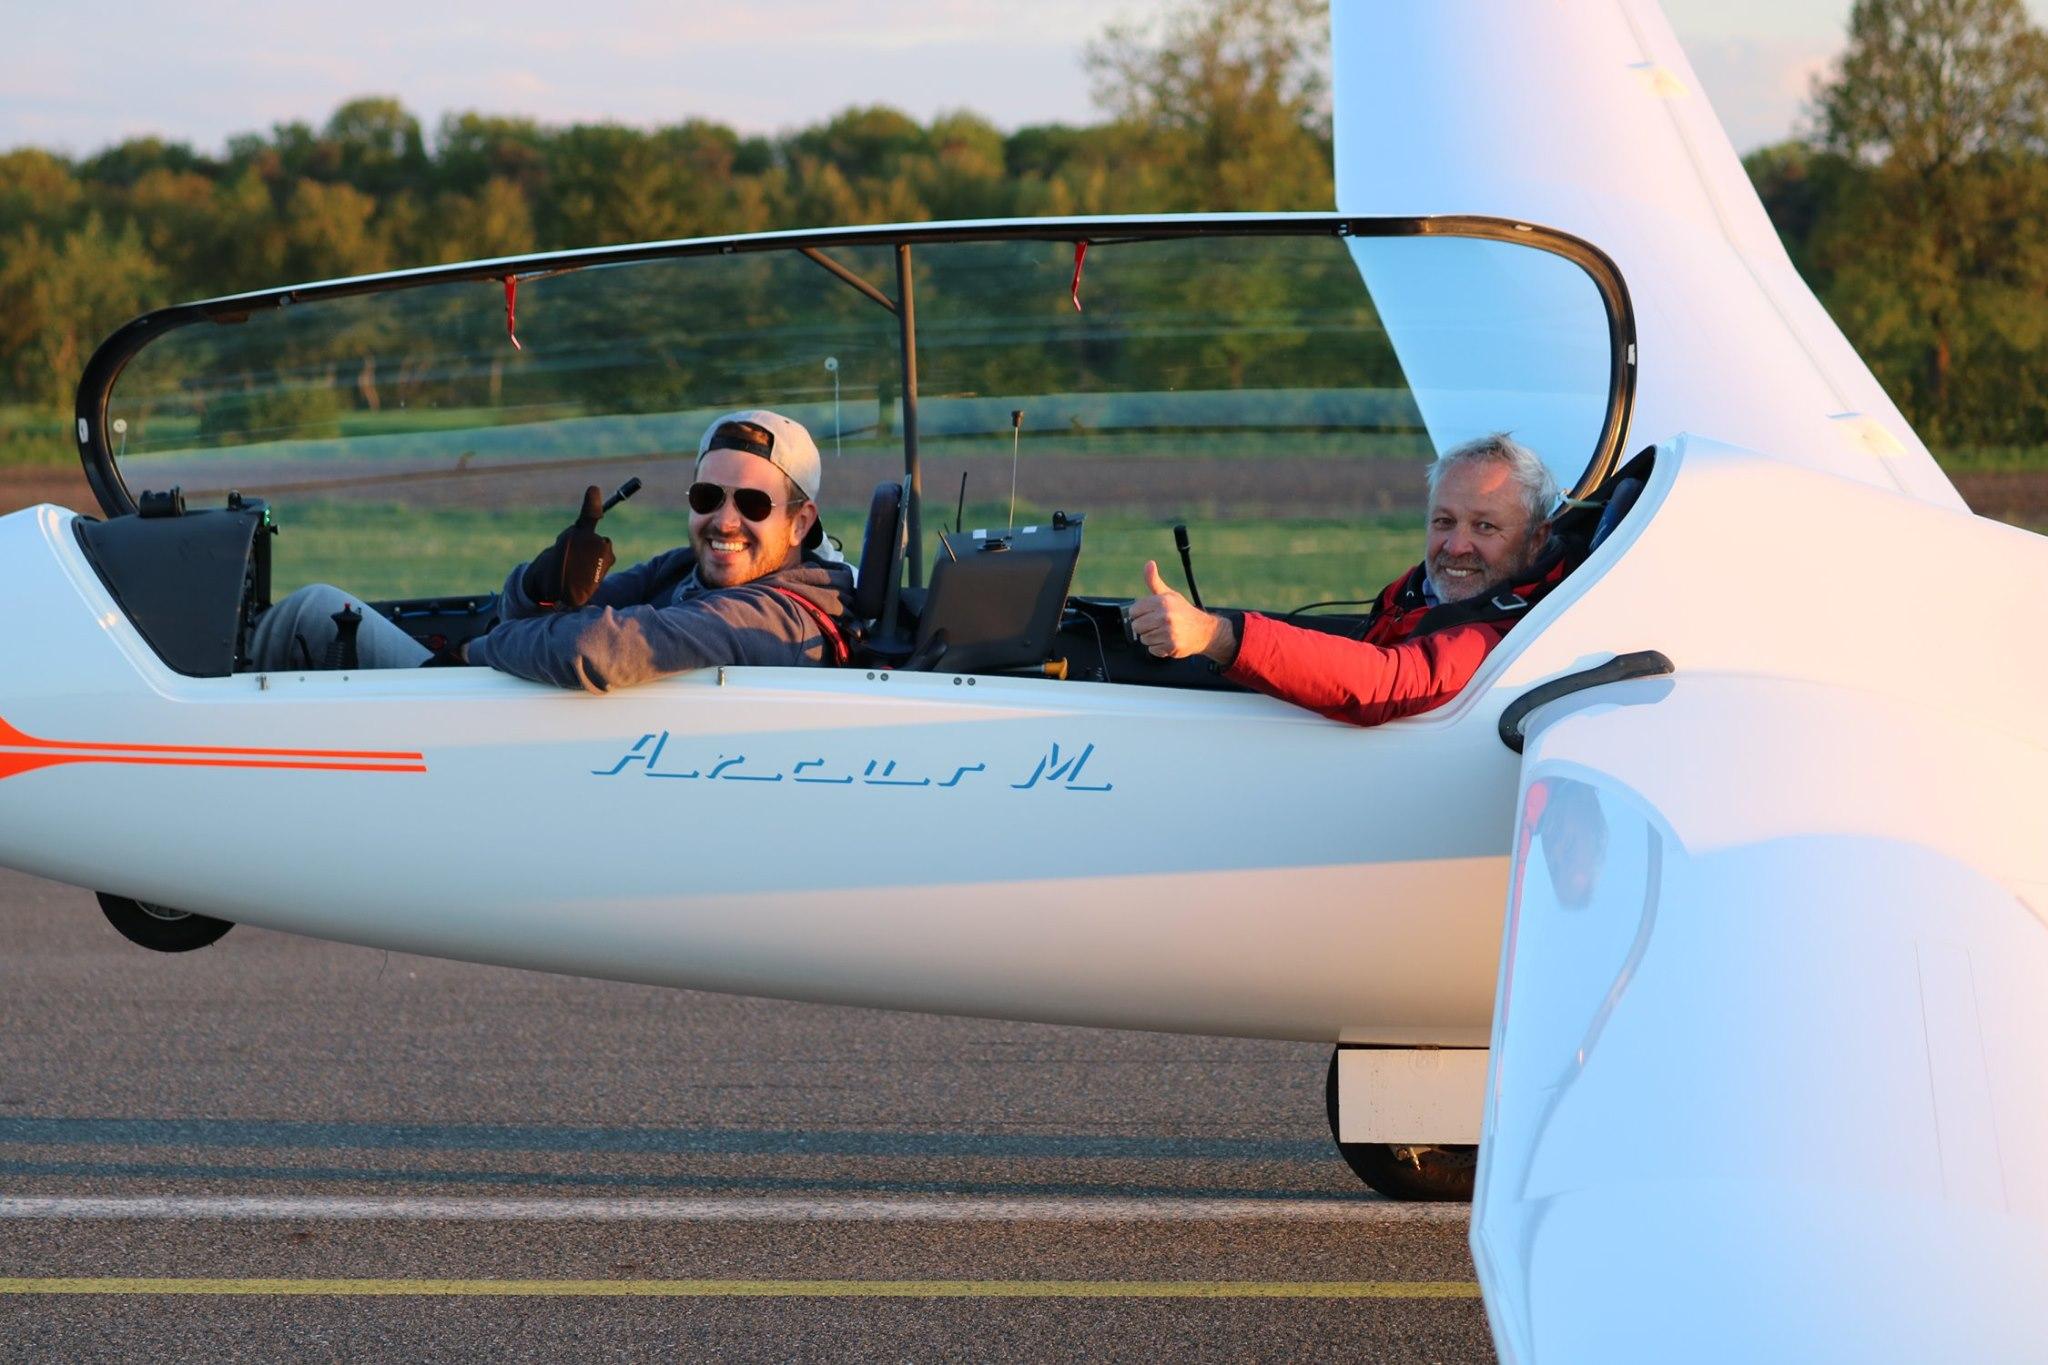 Flug 1: Max und Bernd